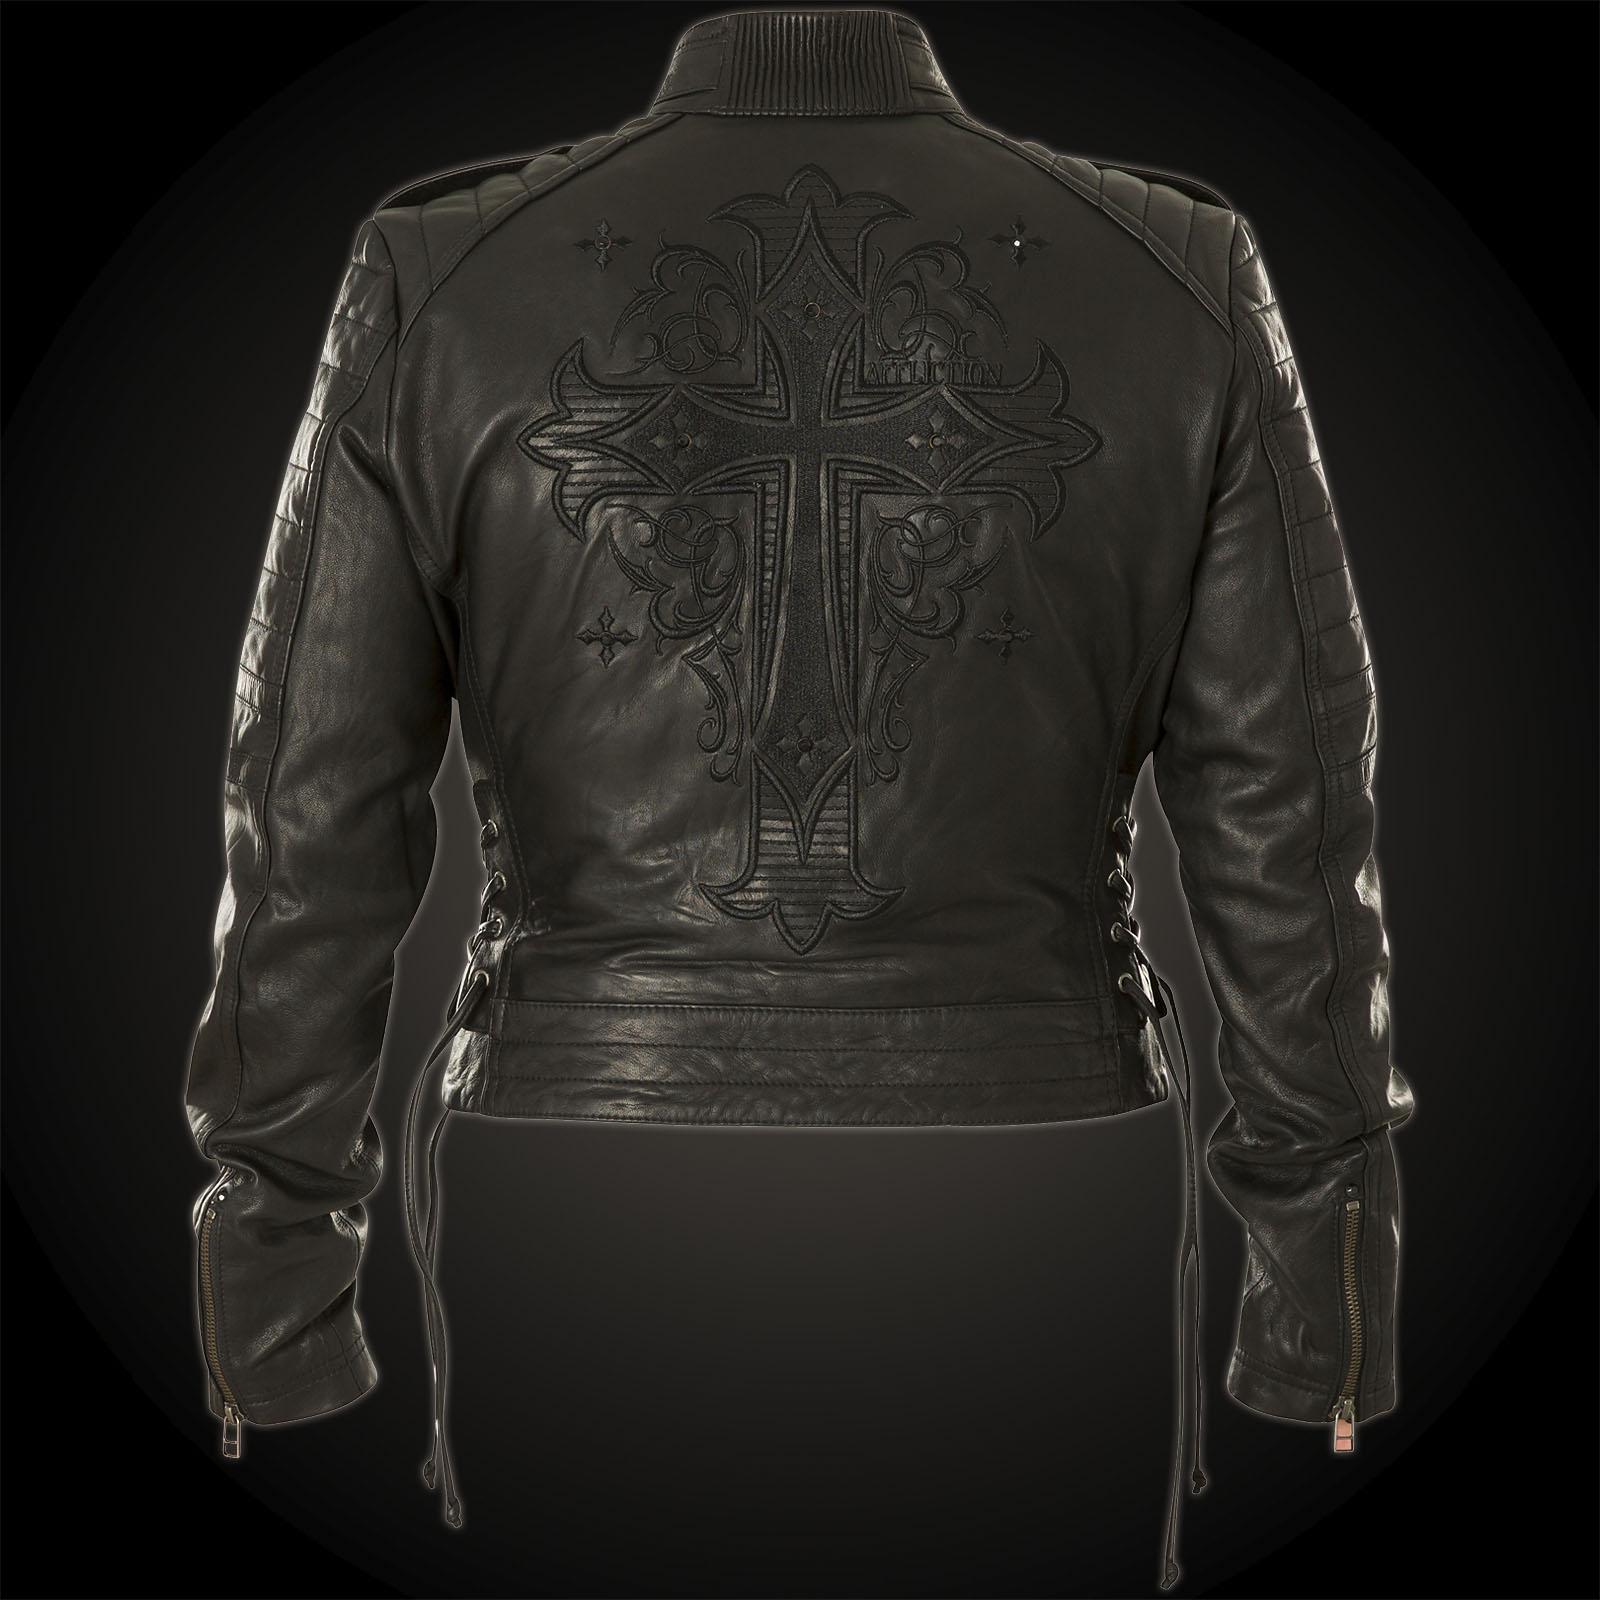 Affliction Woman Jacket Leather Blacktrail Black T1uKlFJc3